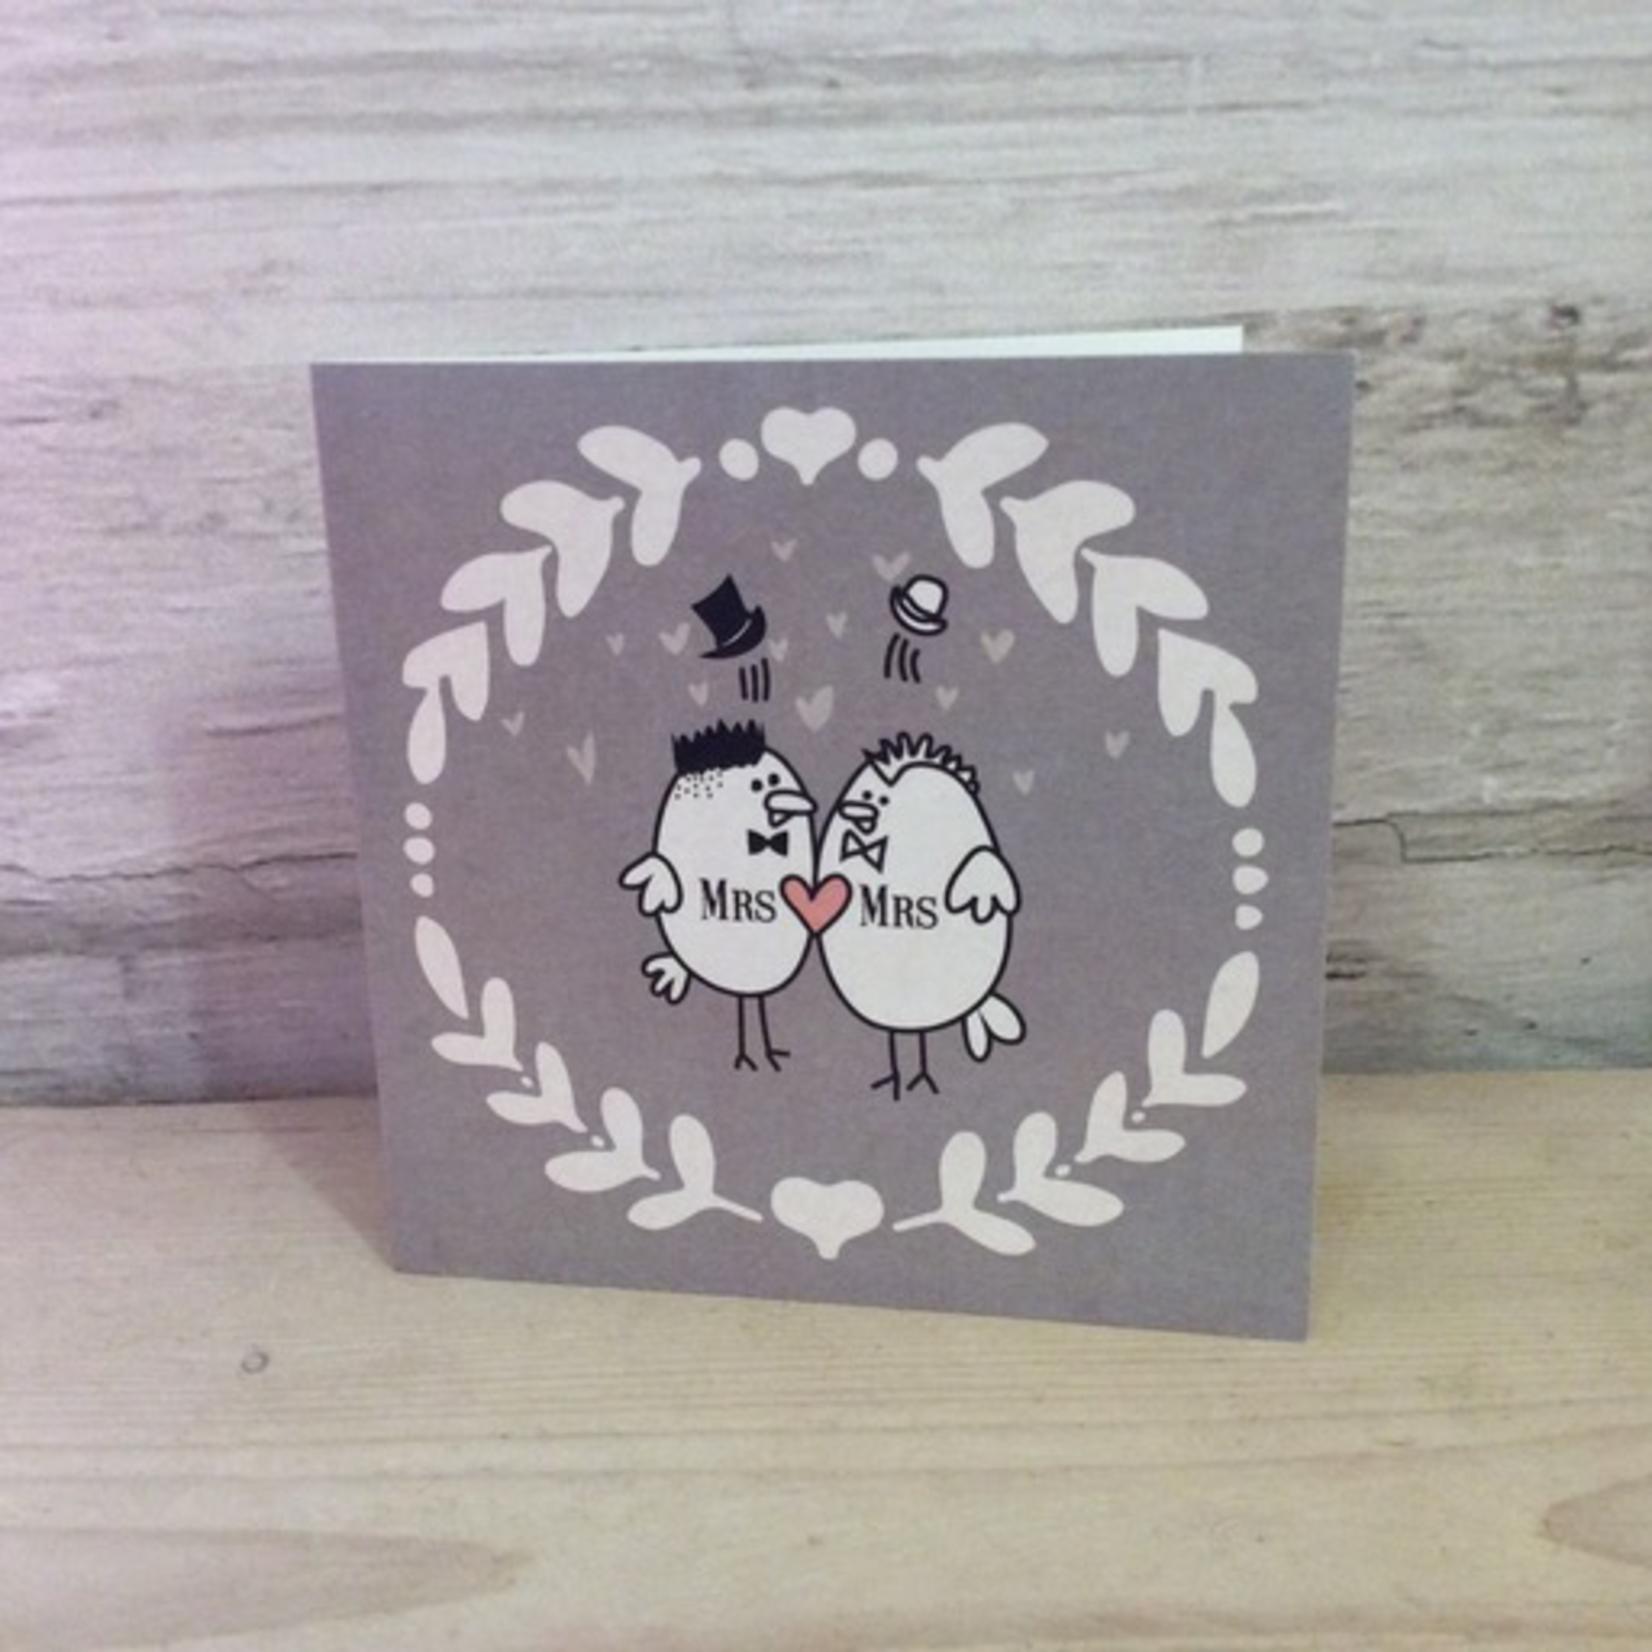 Homebird Homebird Designed Birdy Vintage Mrs & Mrs Card